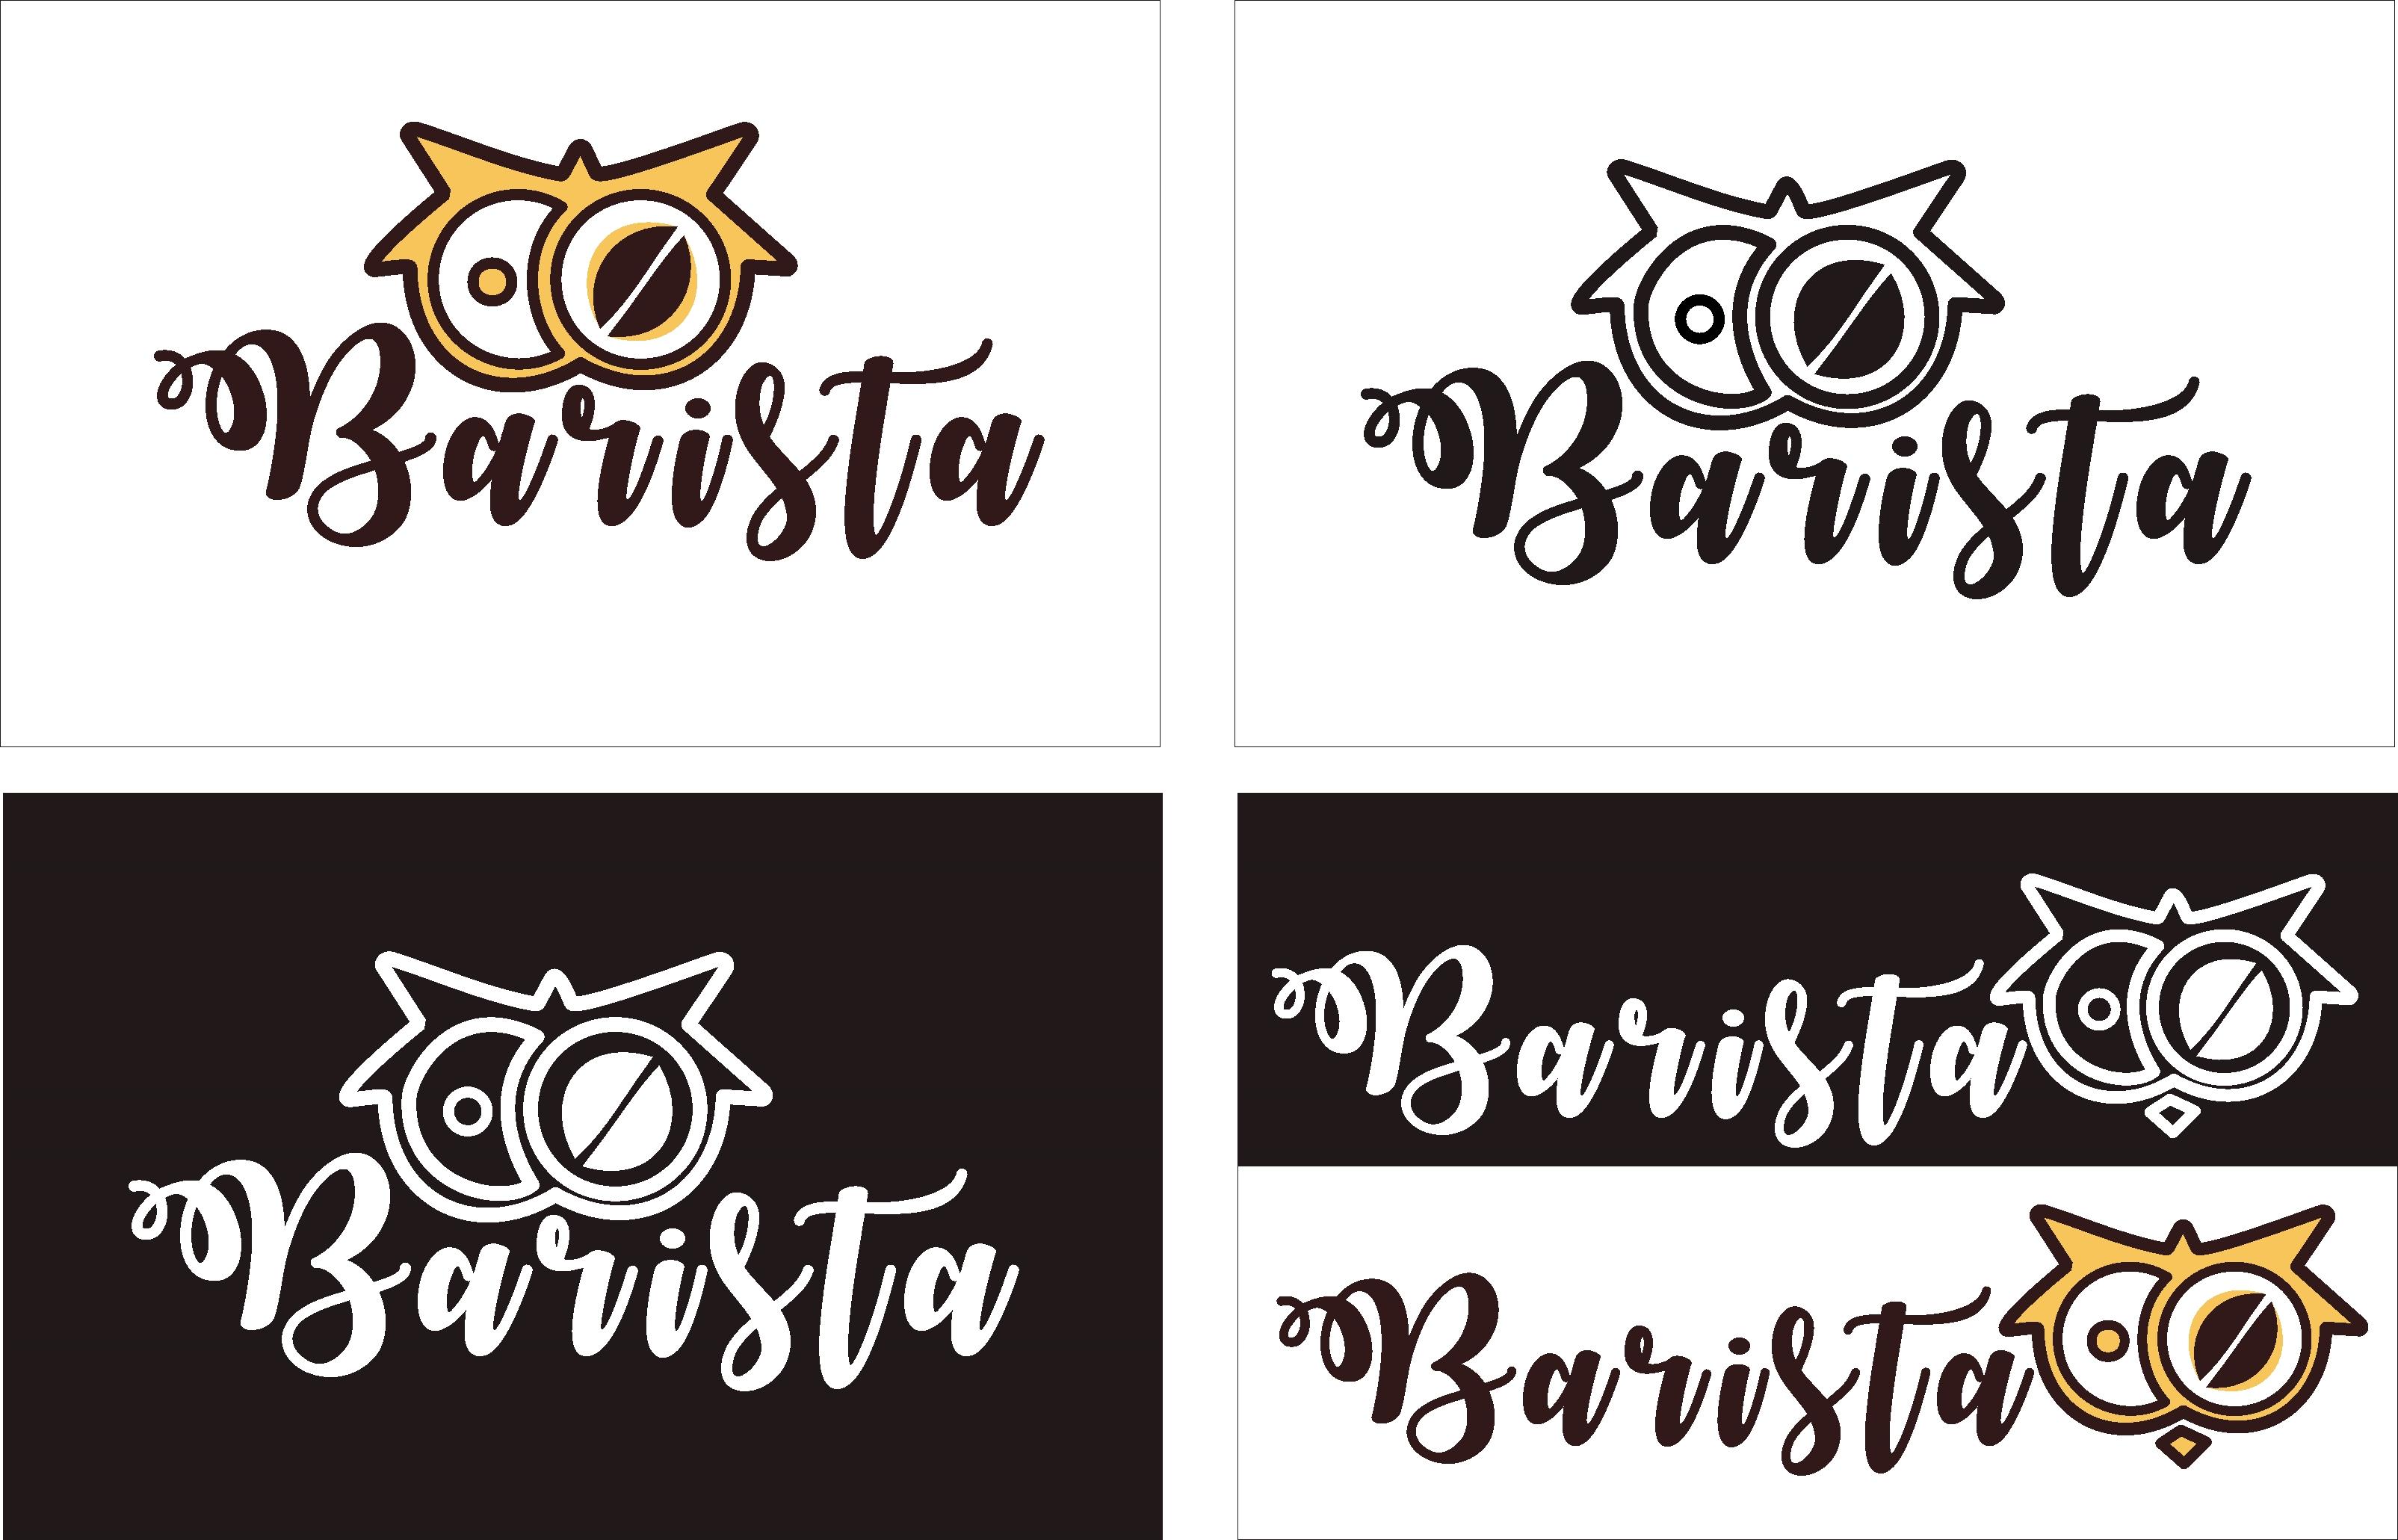 Ребрендинг логотипа сети кофеен фото f_9765e78bdb117598.jpg